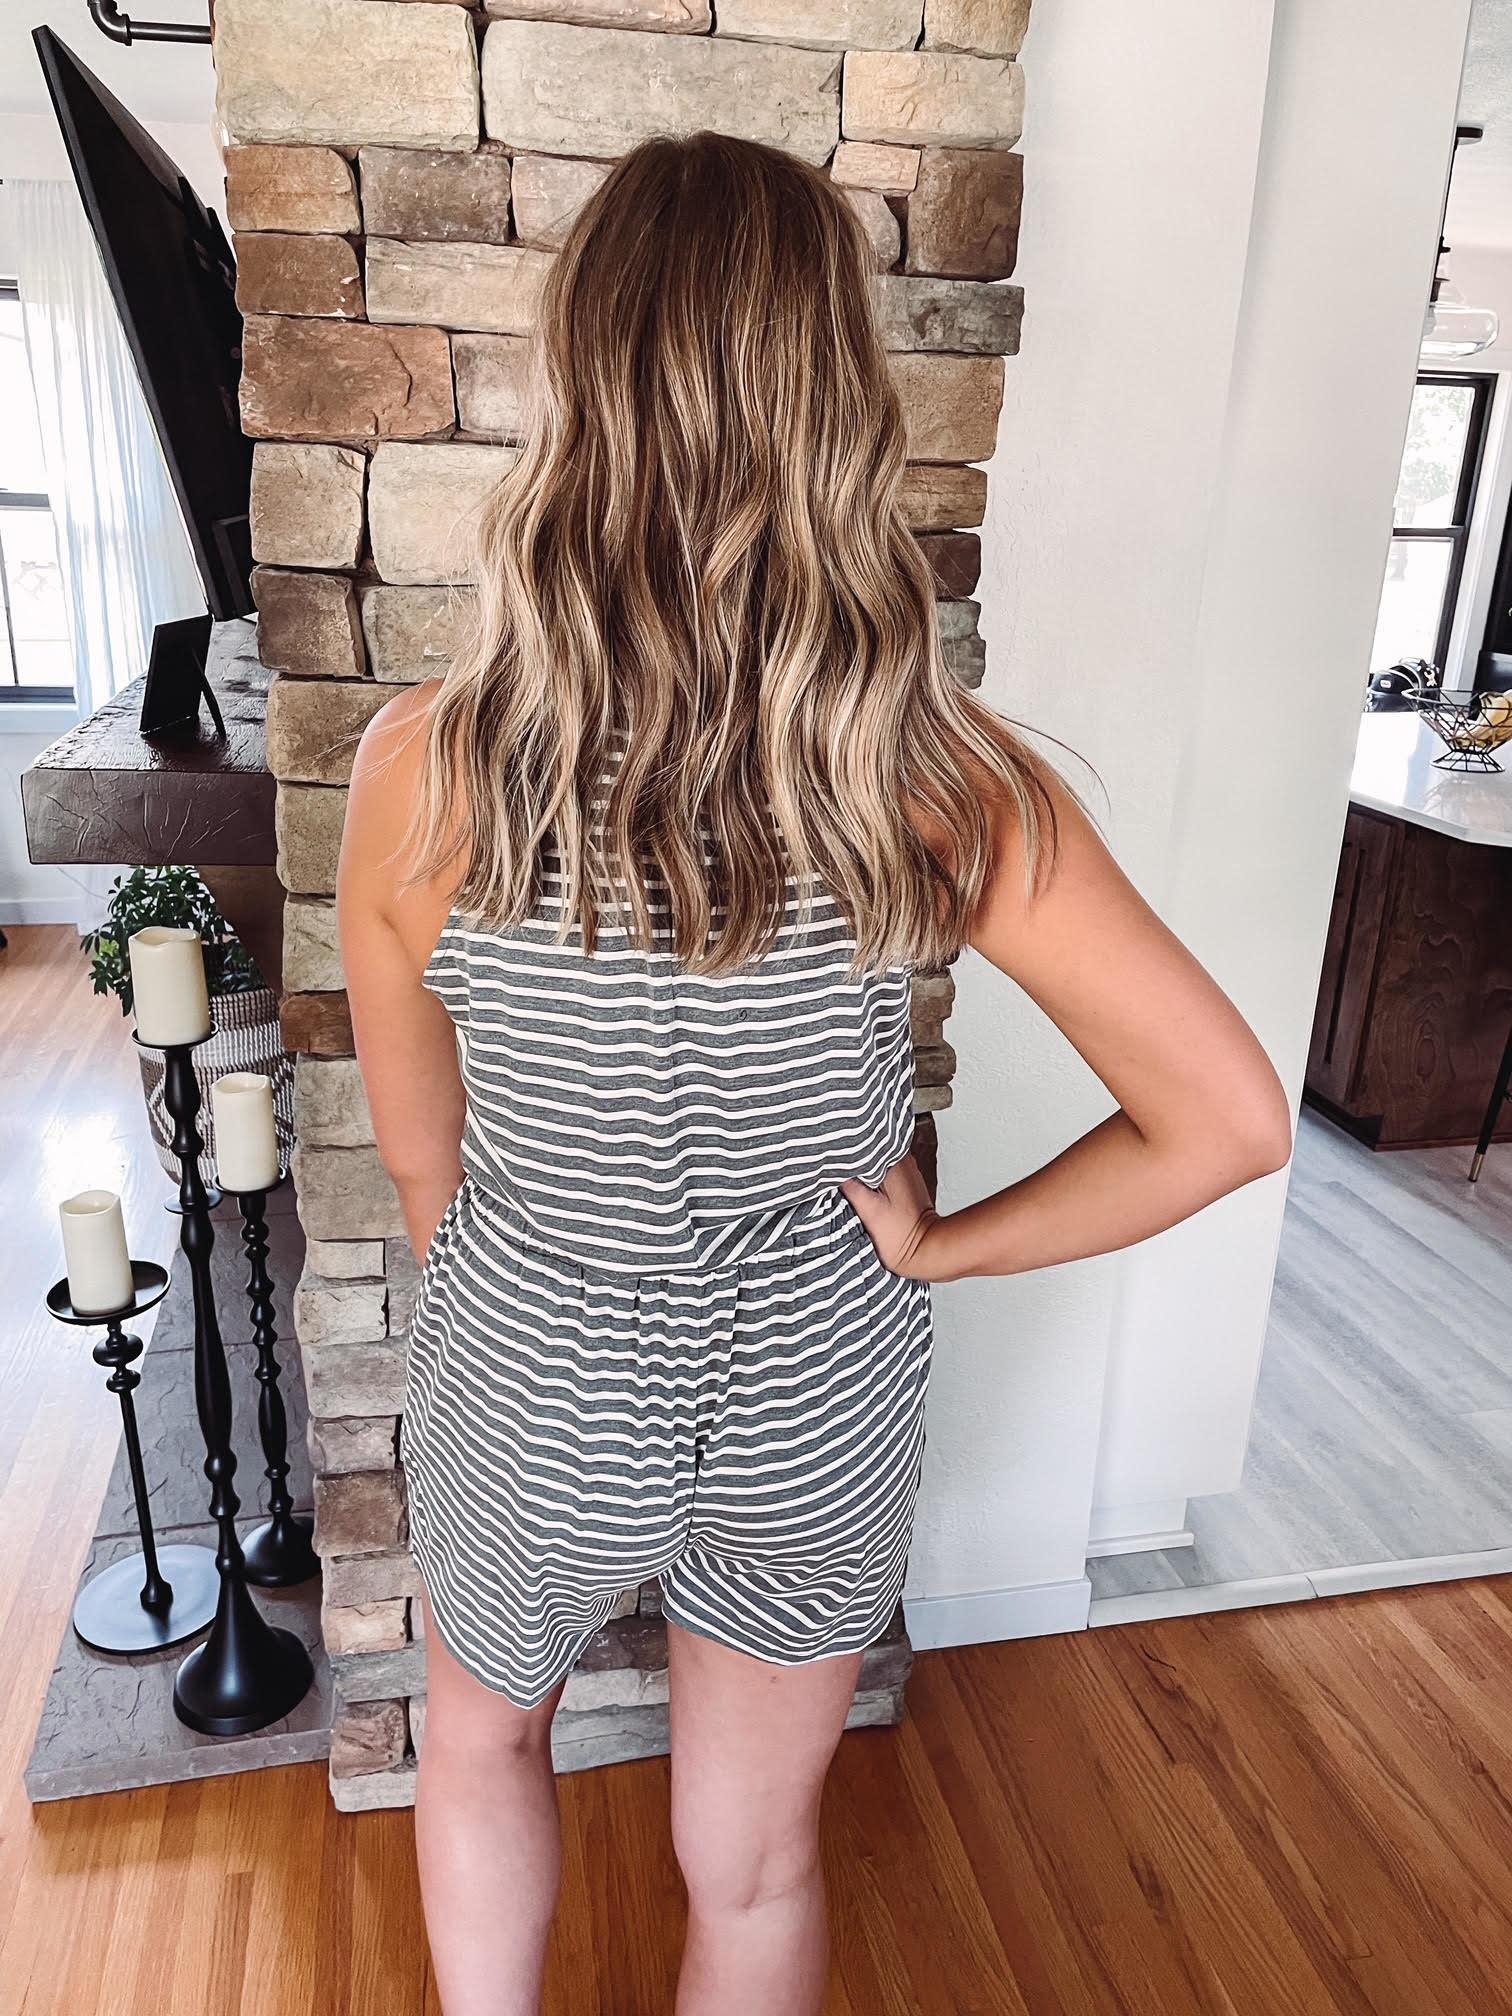 Kendra Striped Romper